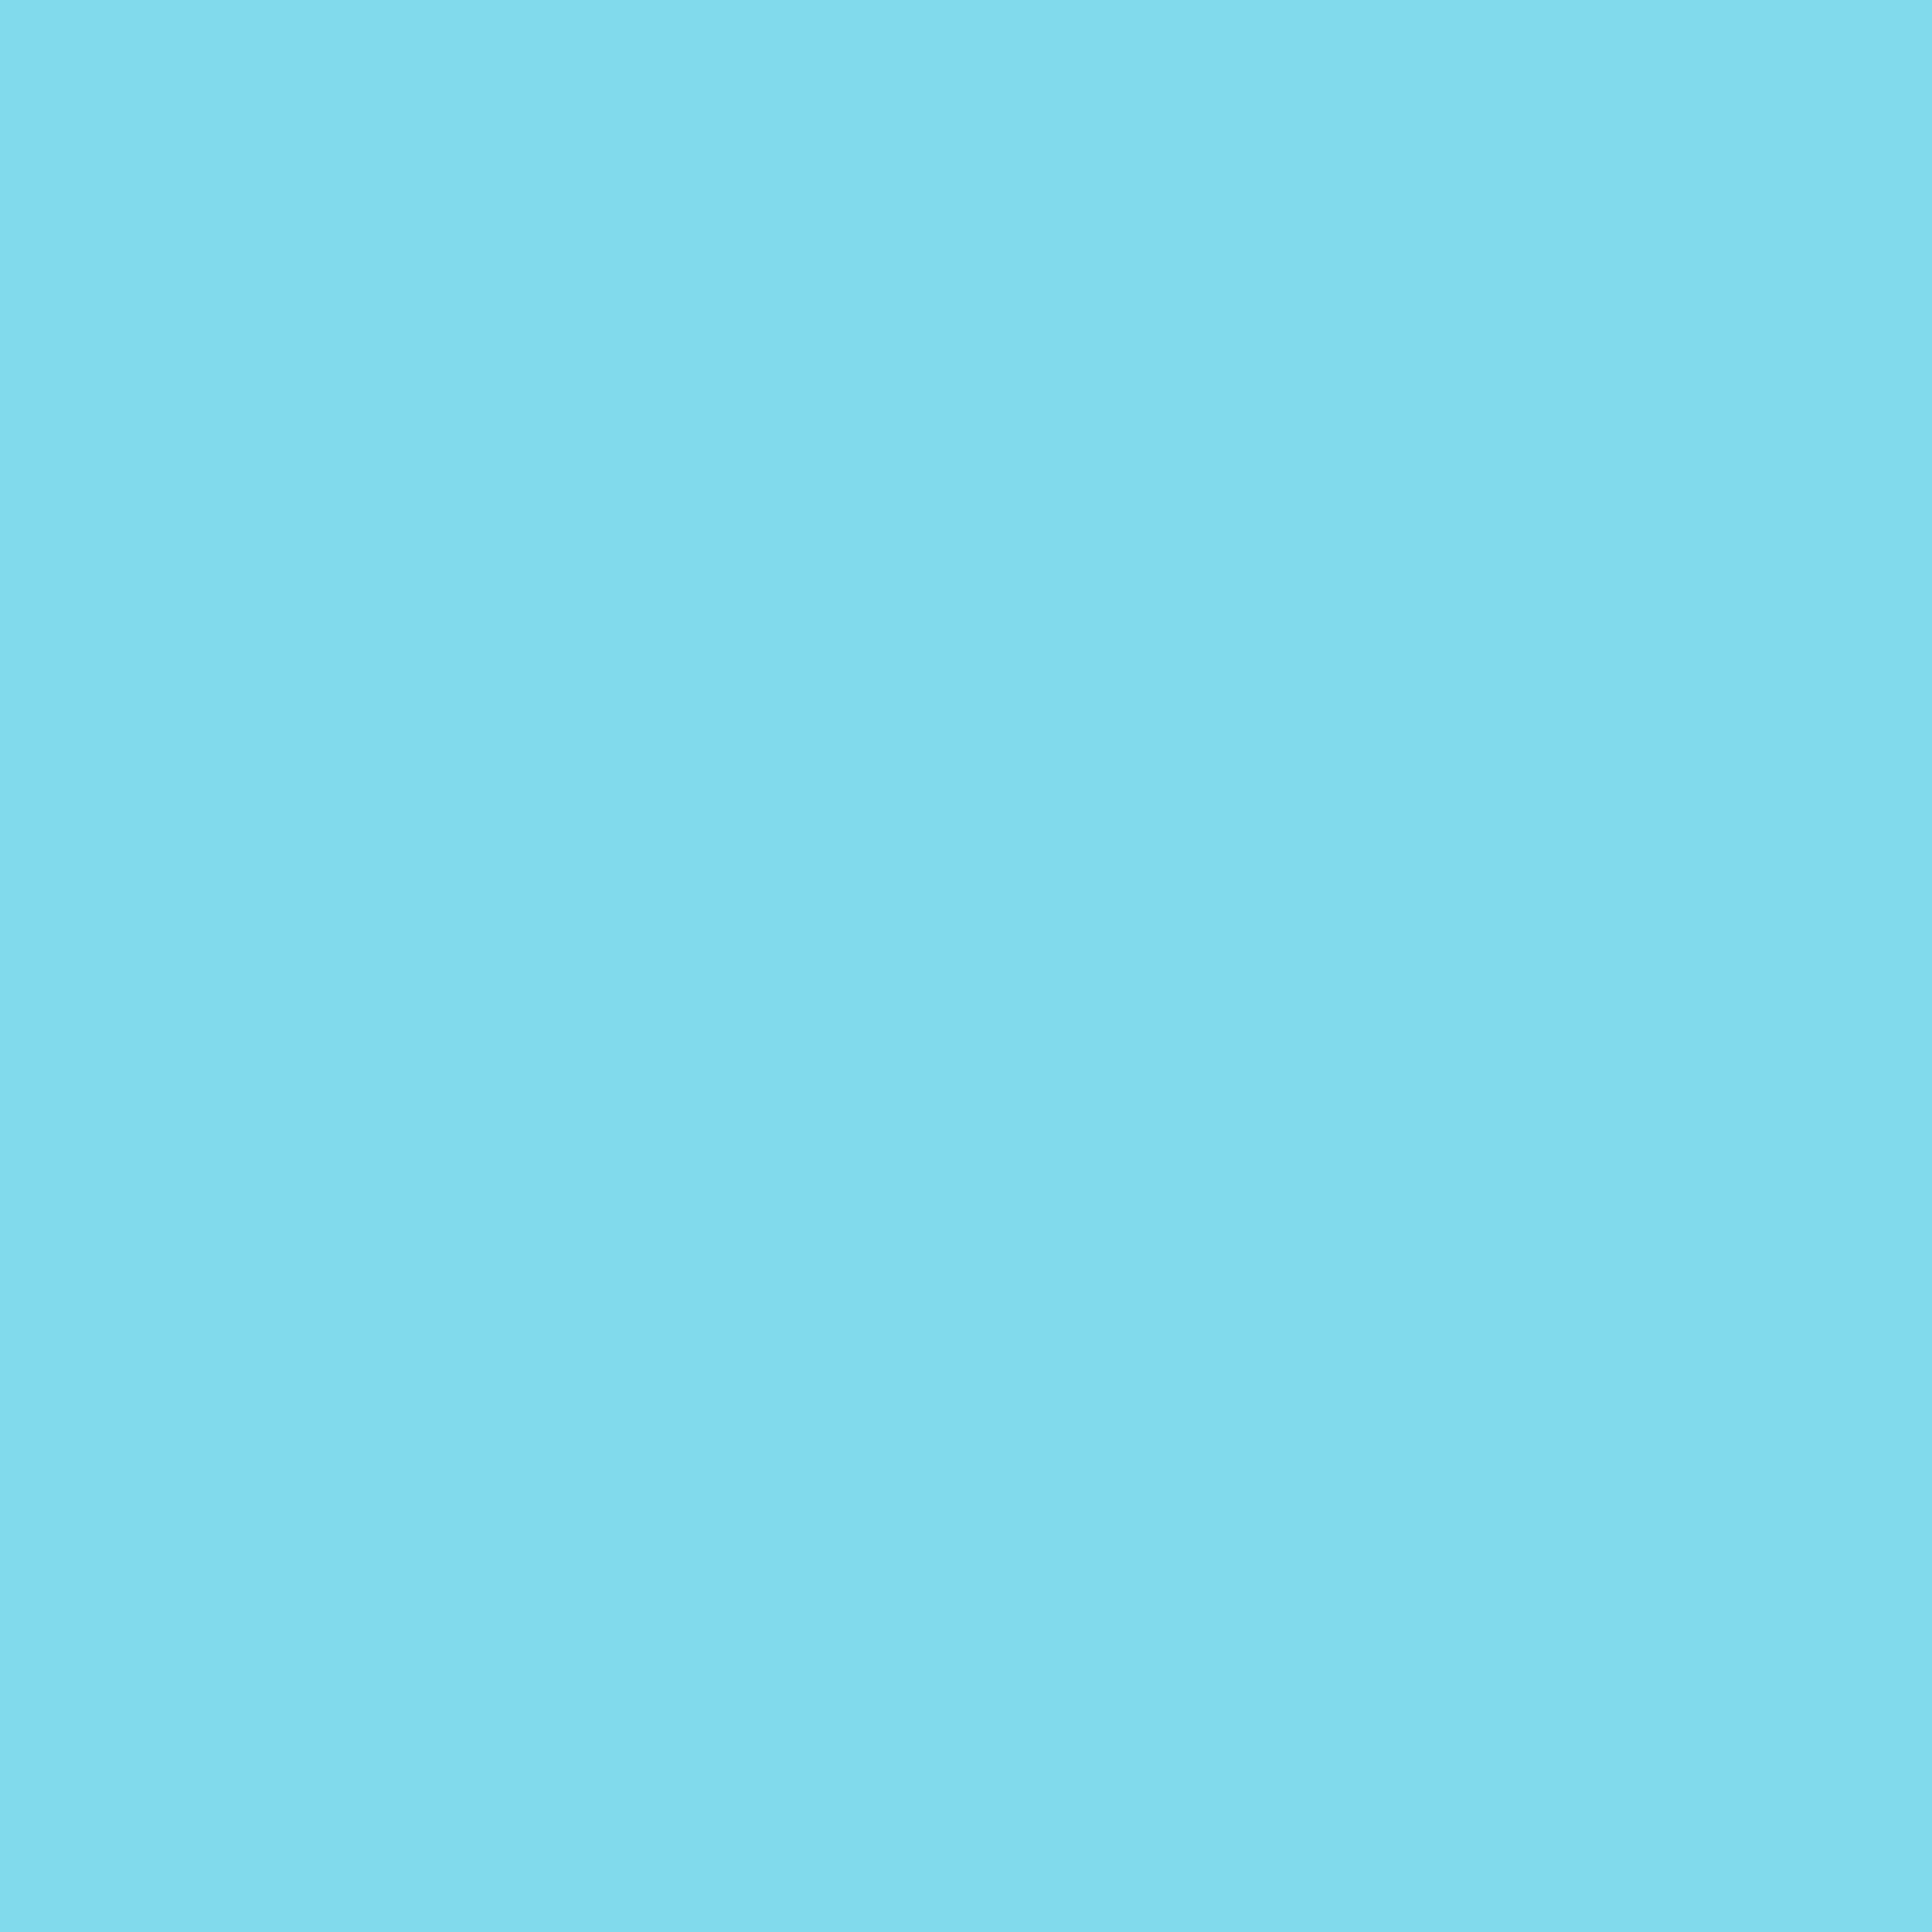 2048x2048 Medium Sky Blue Solid Color Background